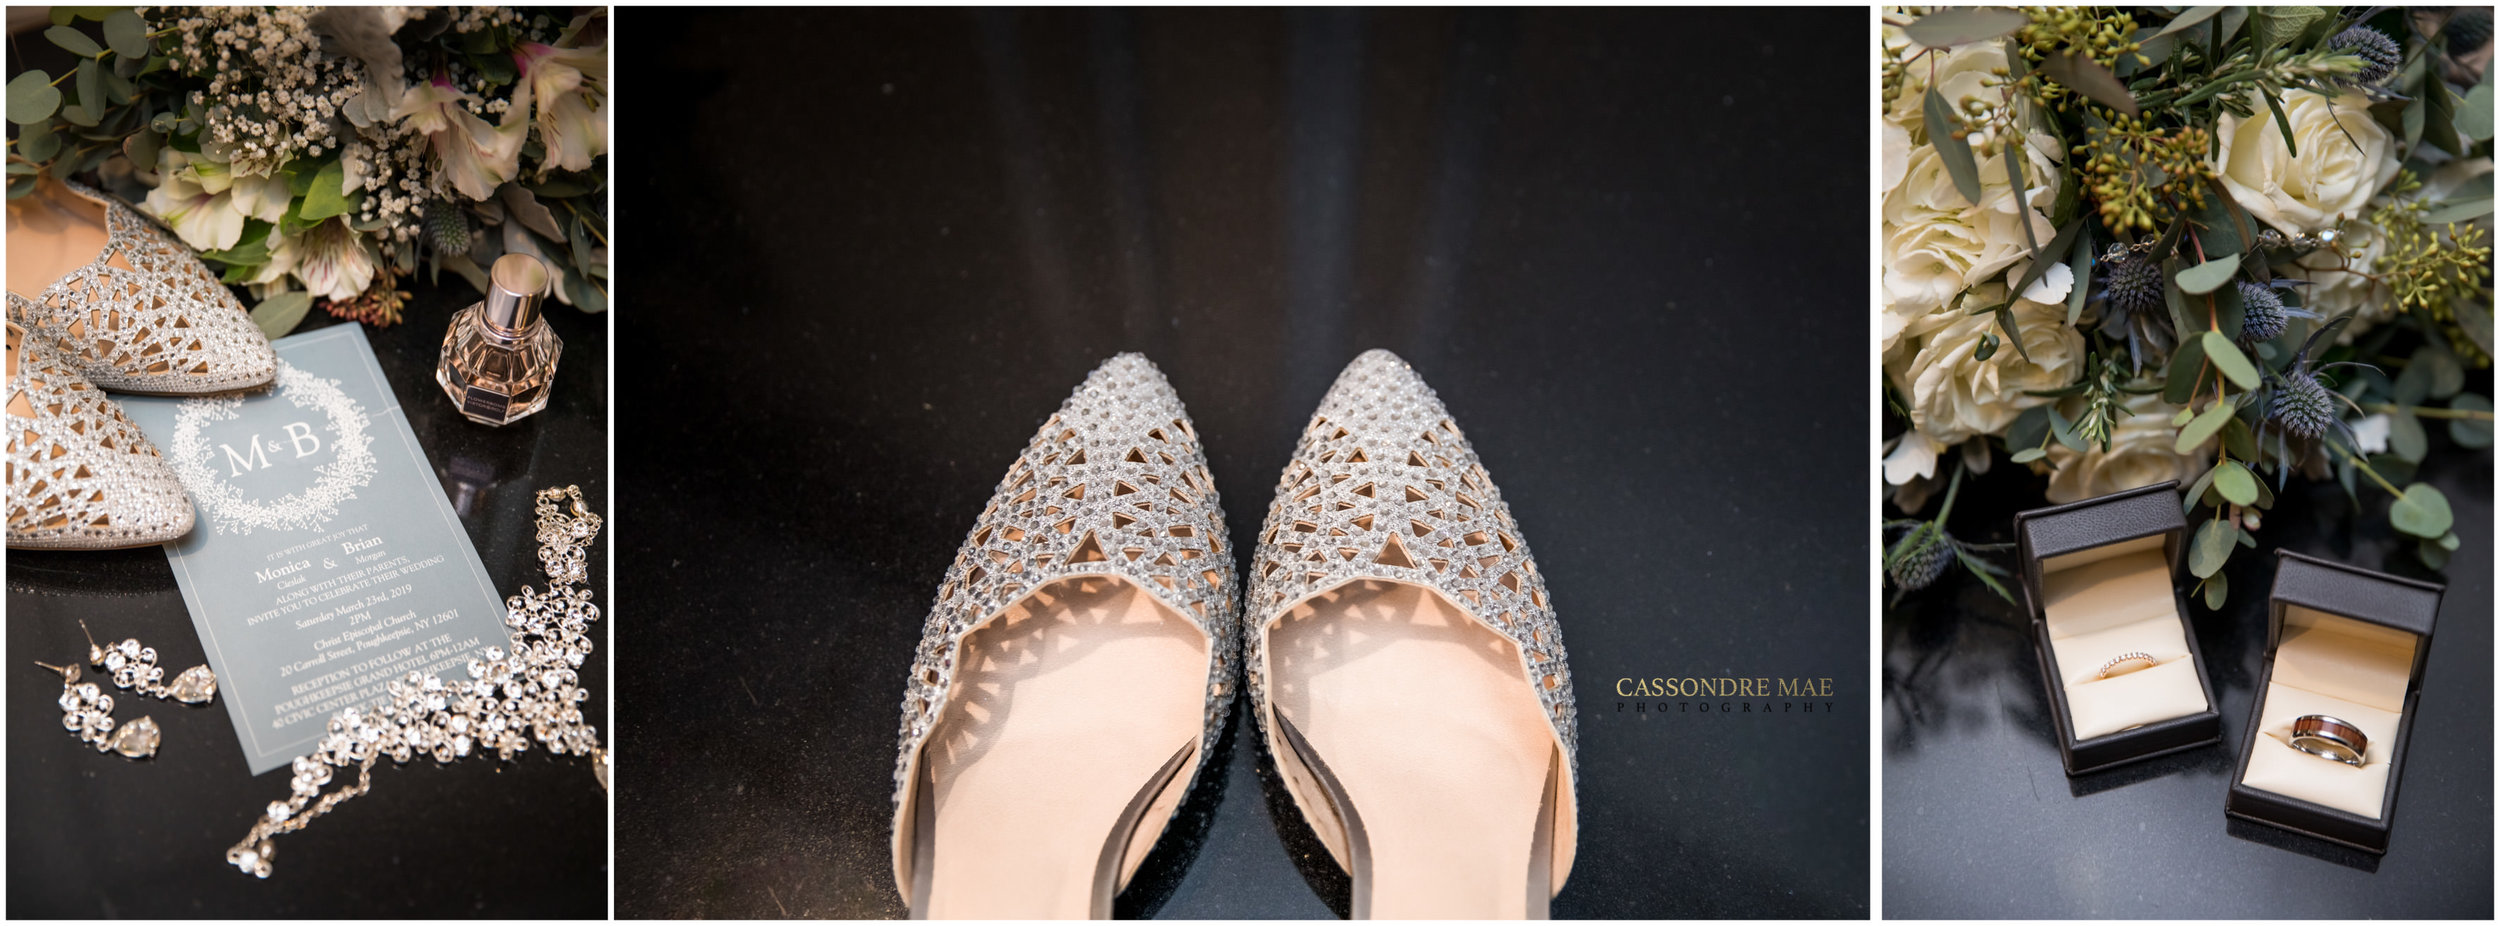 Cassondre Mae Photography Poughkeepsie NY Wedding 1.jpg